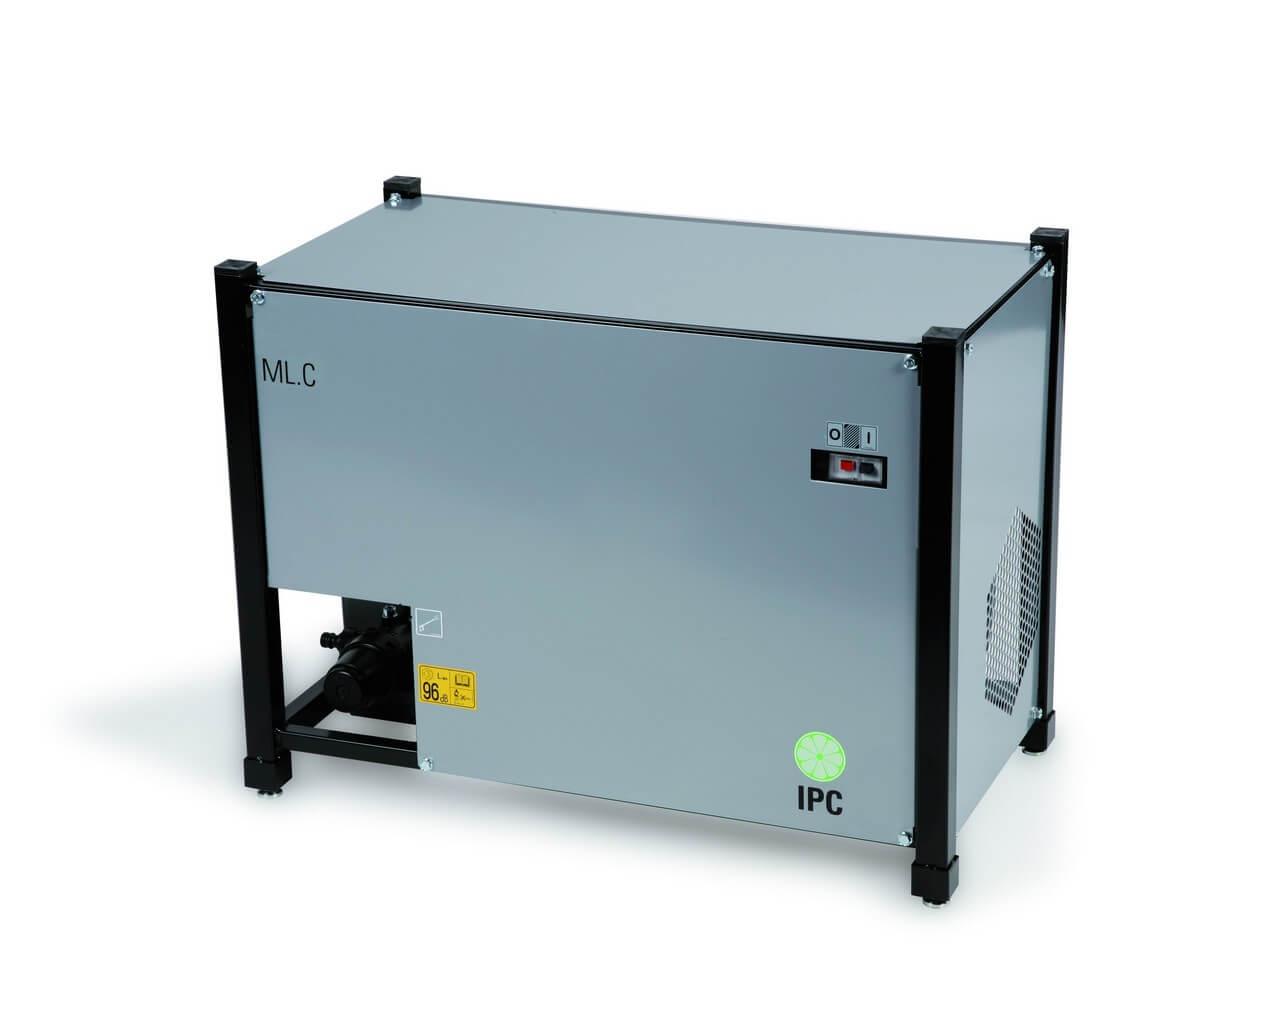 CLEN MLC-C D 2117 - Kailatec Oy Verkkokauppa